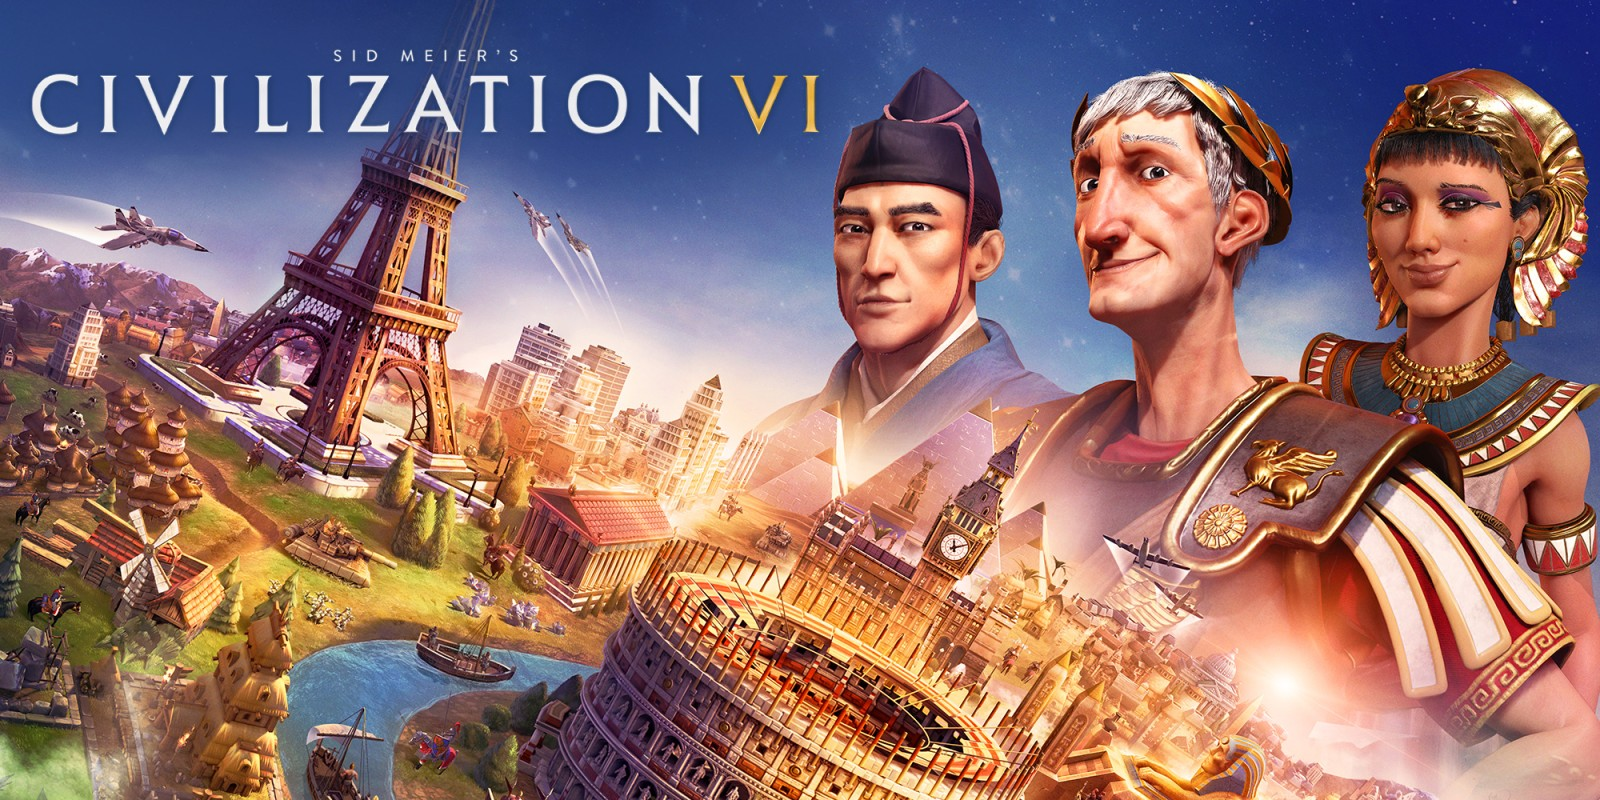 Sid Meier's Civilization VI Switch review – strategic win